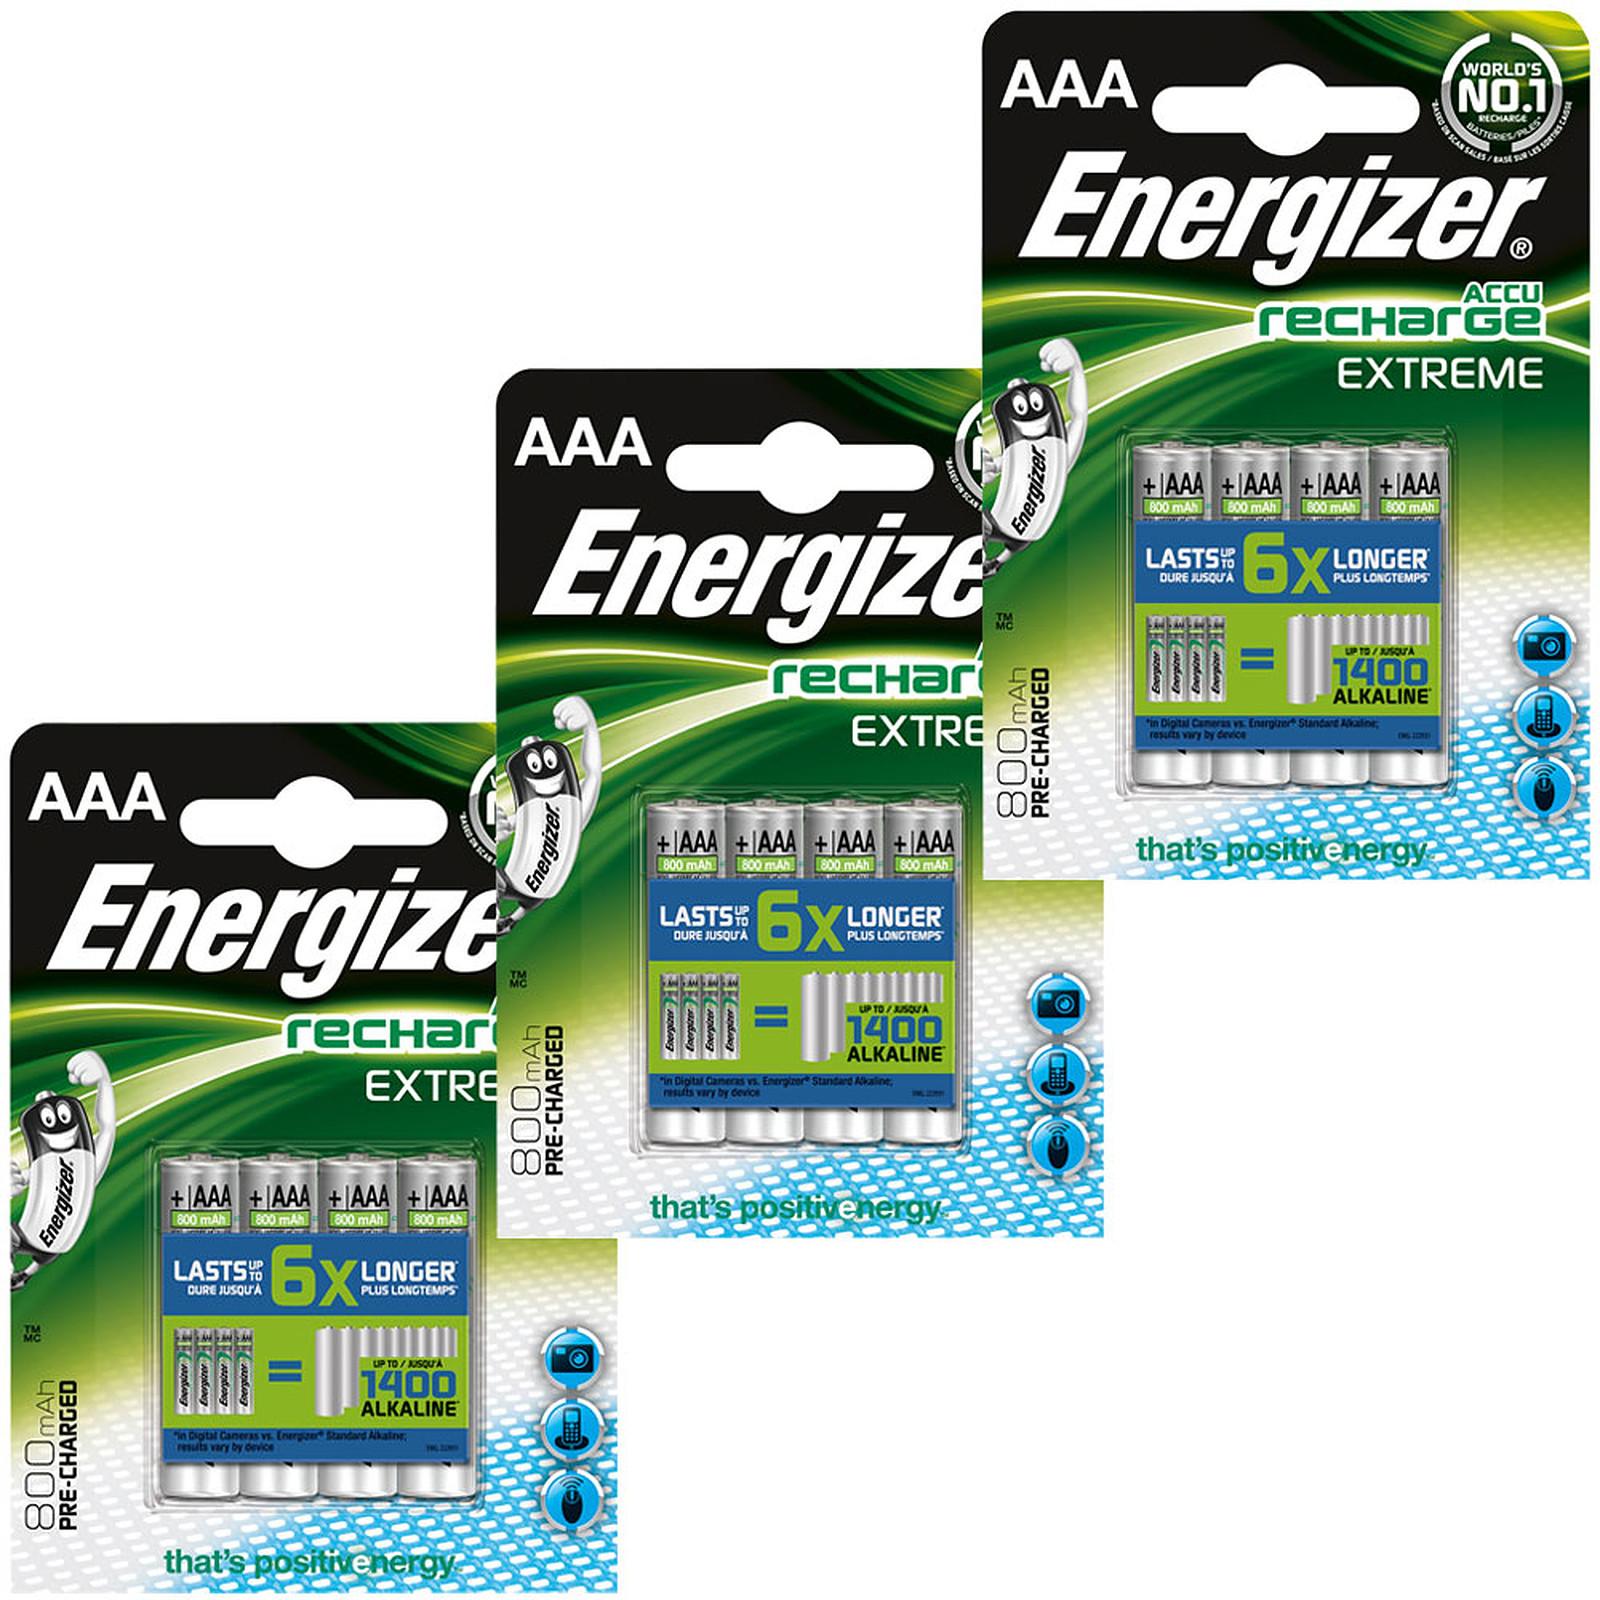 Energizer Accu Recharge Extreme AAA 800 mAh (par 12)